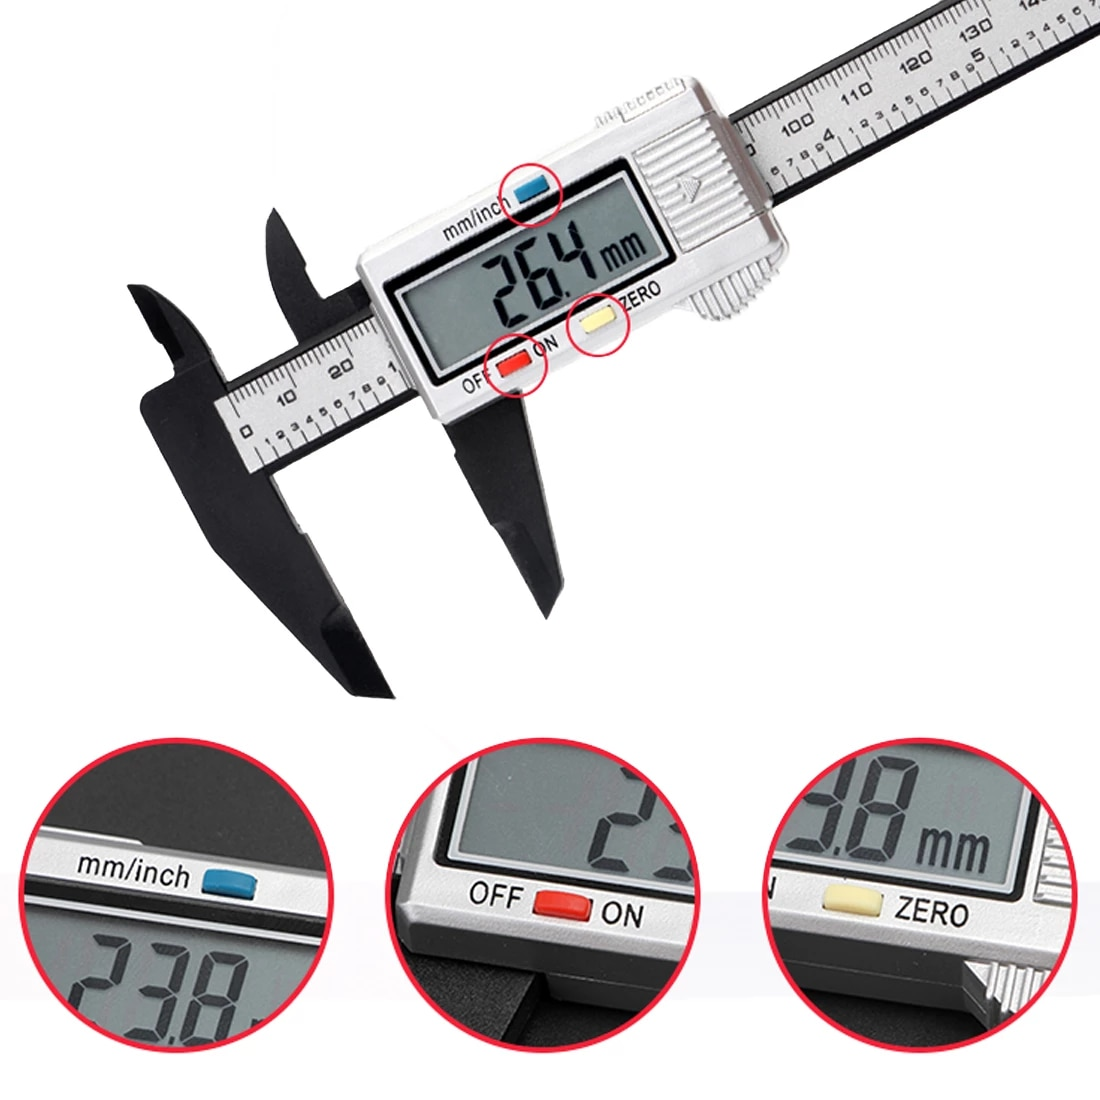 150mm 6inch Lcd Electronic Carbon Fiber Gauge Digital Vernier Calipers Measure Height Measuring Instruments Micrometer Calipers Aliexpress